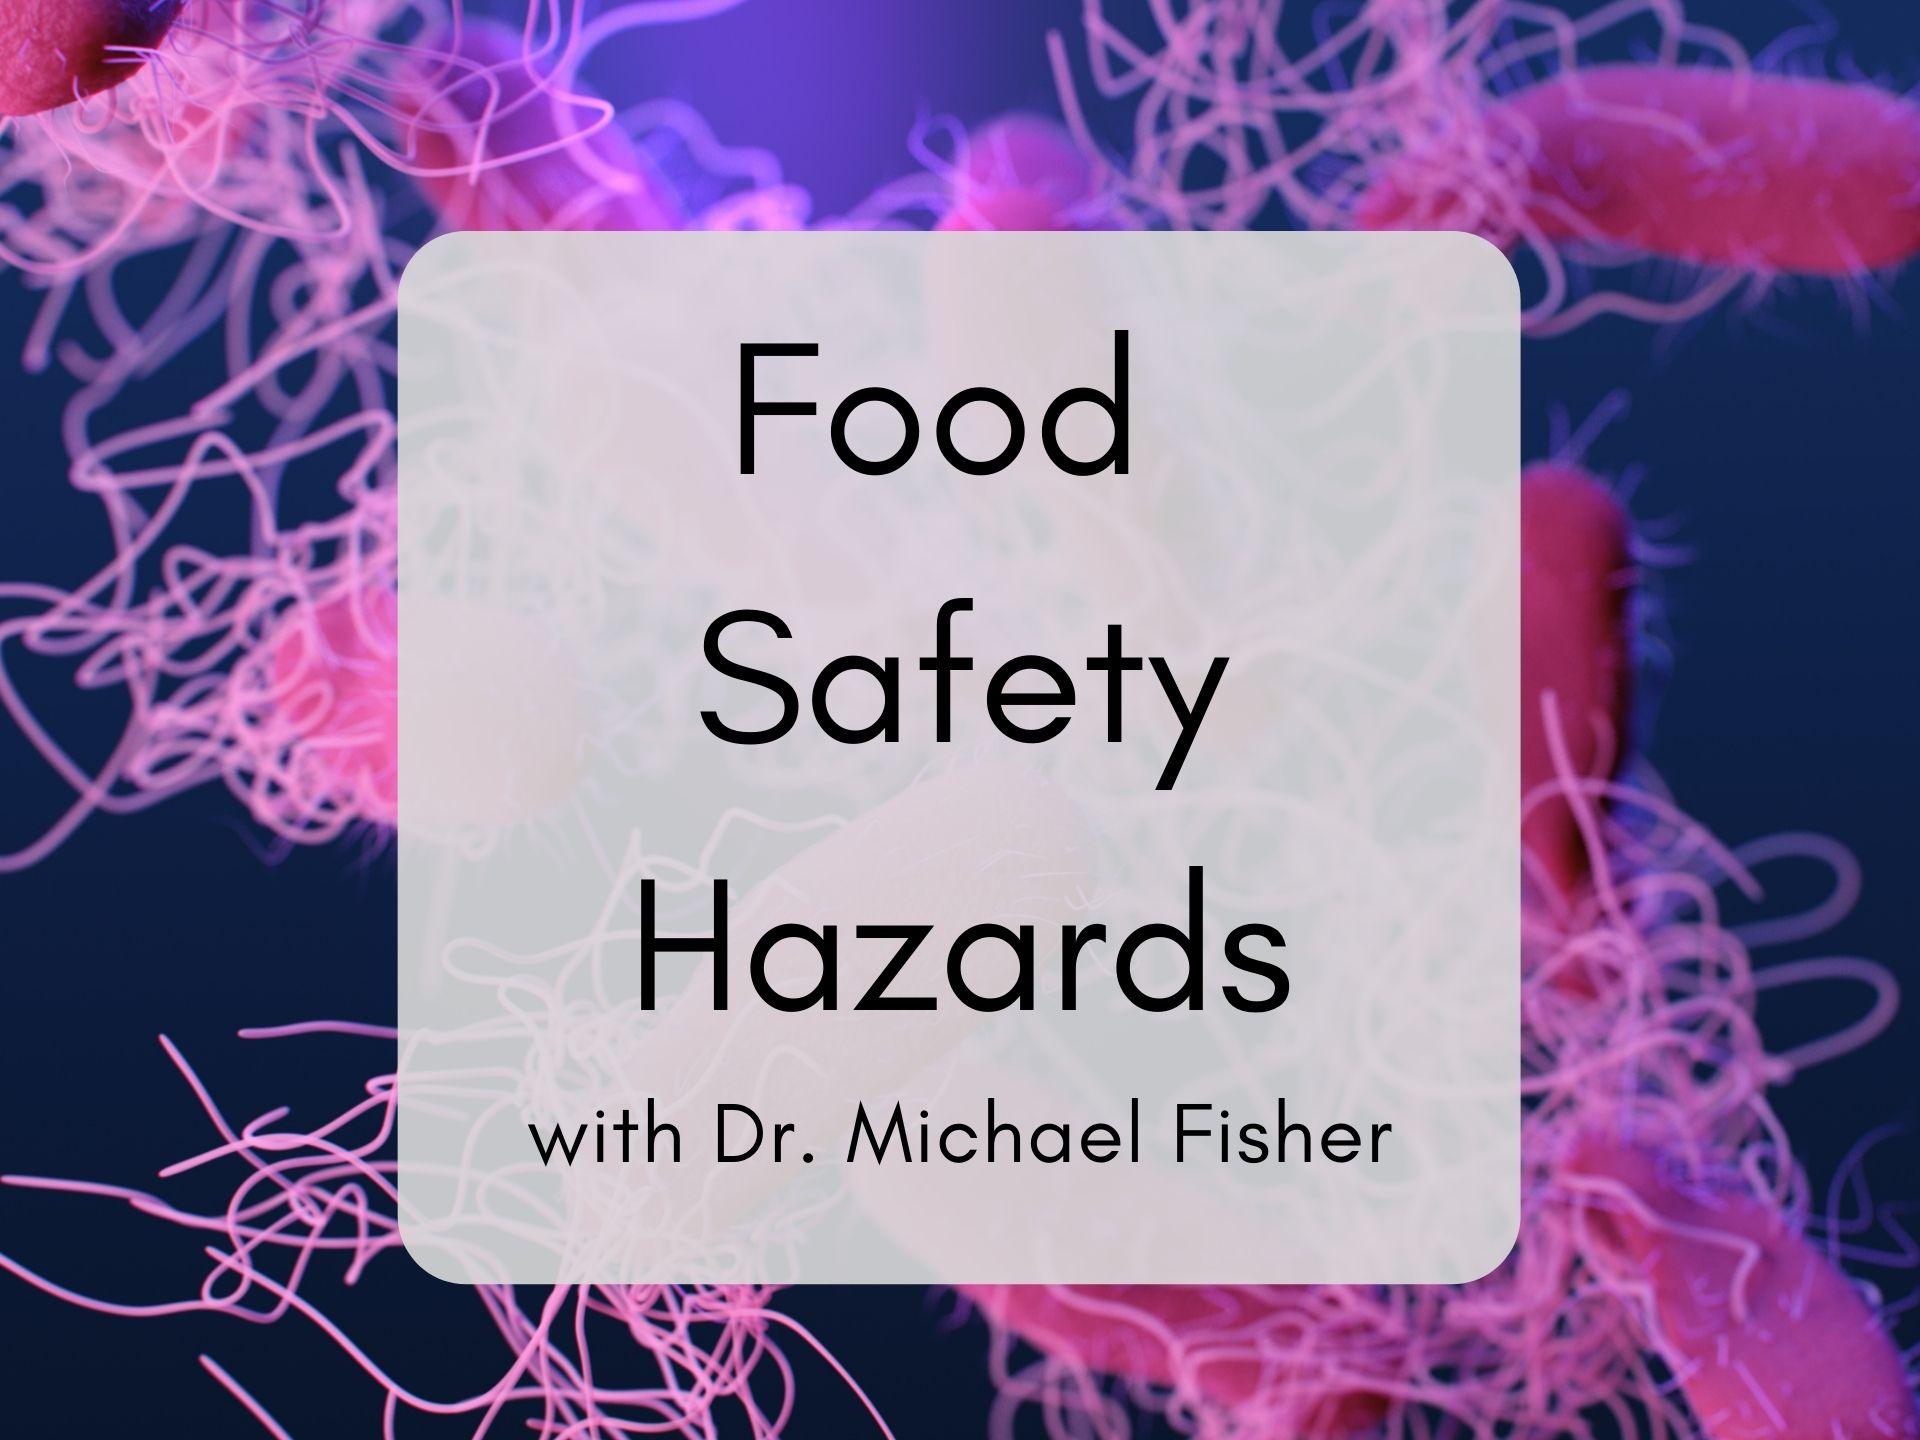 Microbes Food Safety Hazards